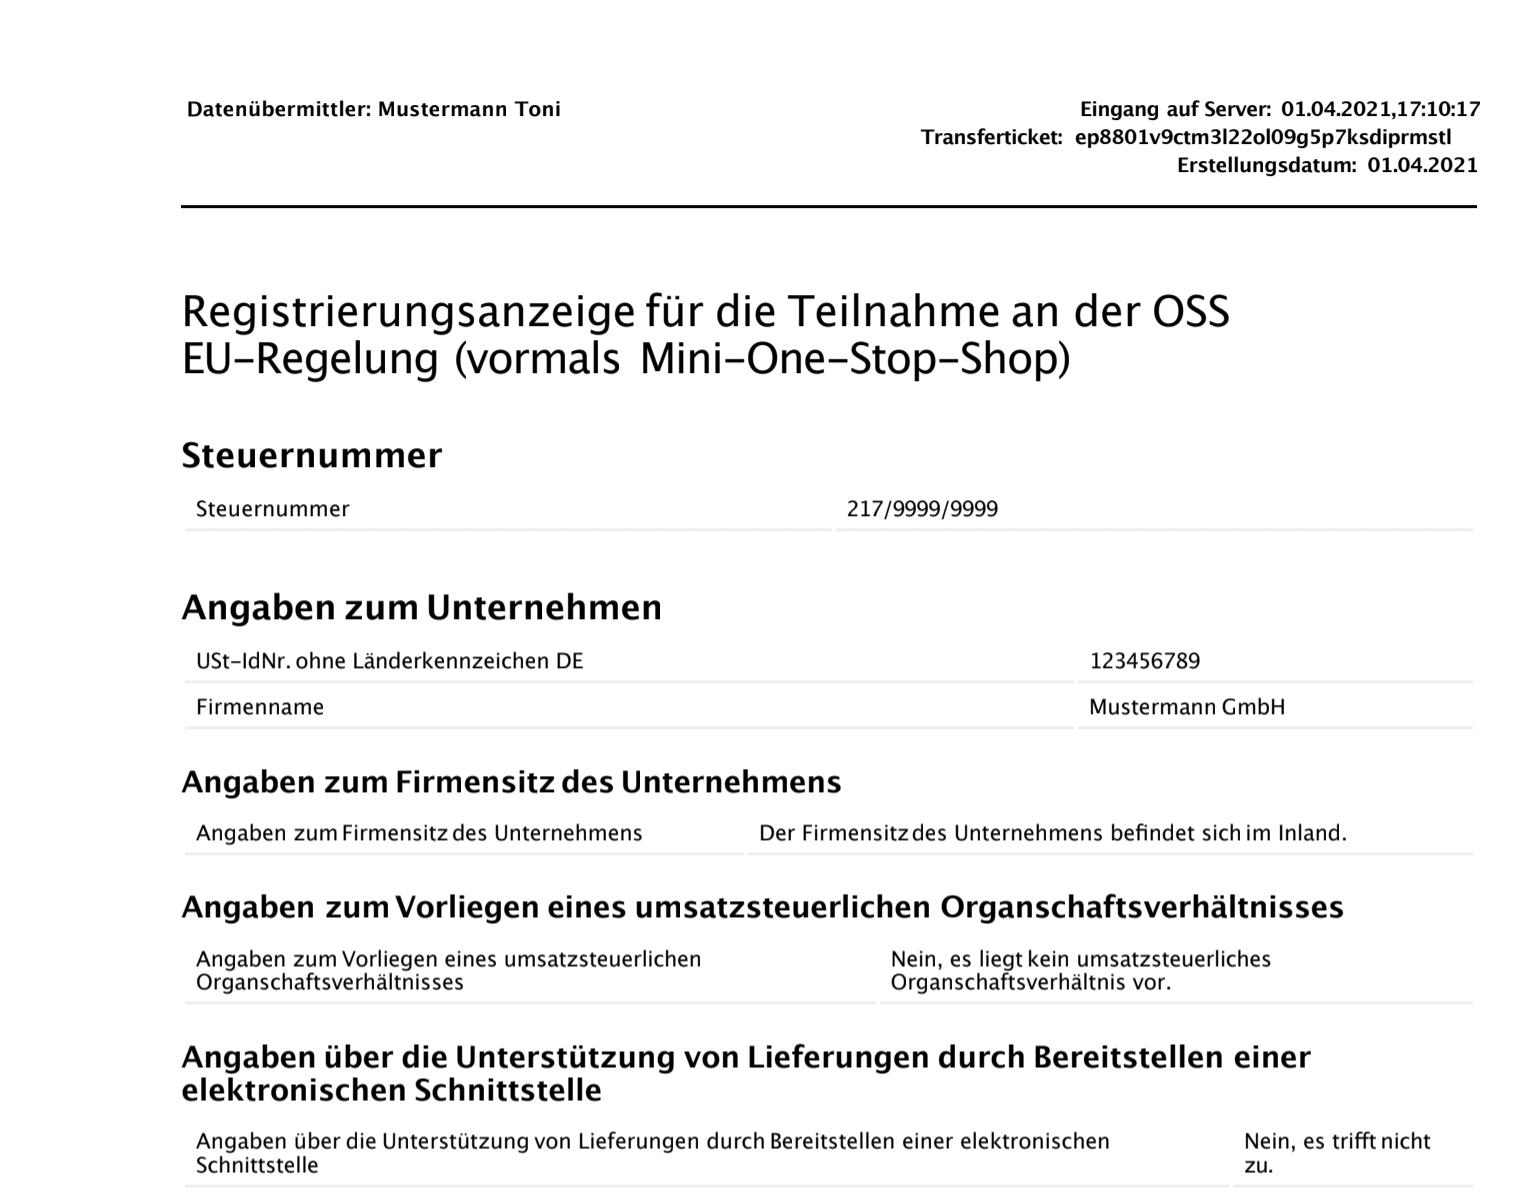 Screenshot: OSS Anmeldeformular / Registrierungsanzeige